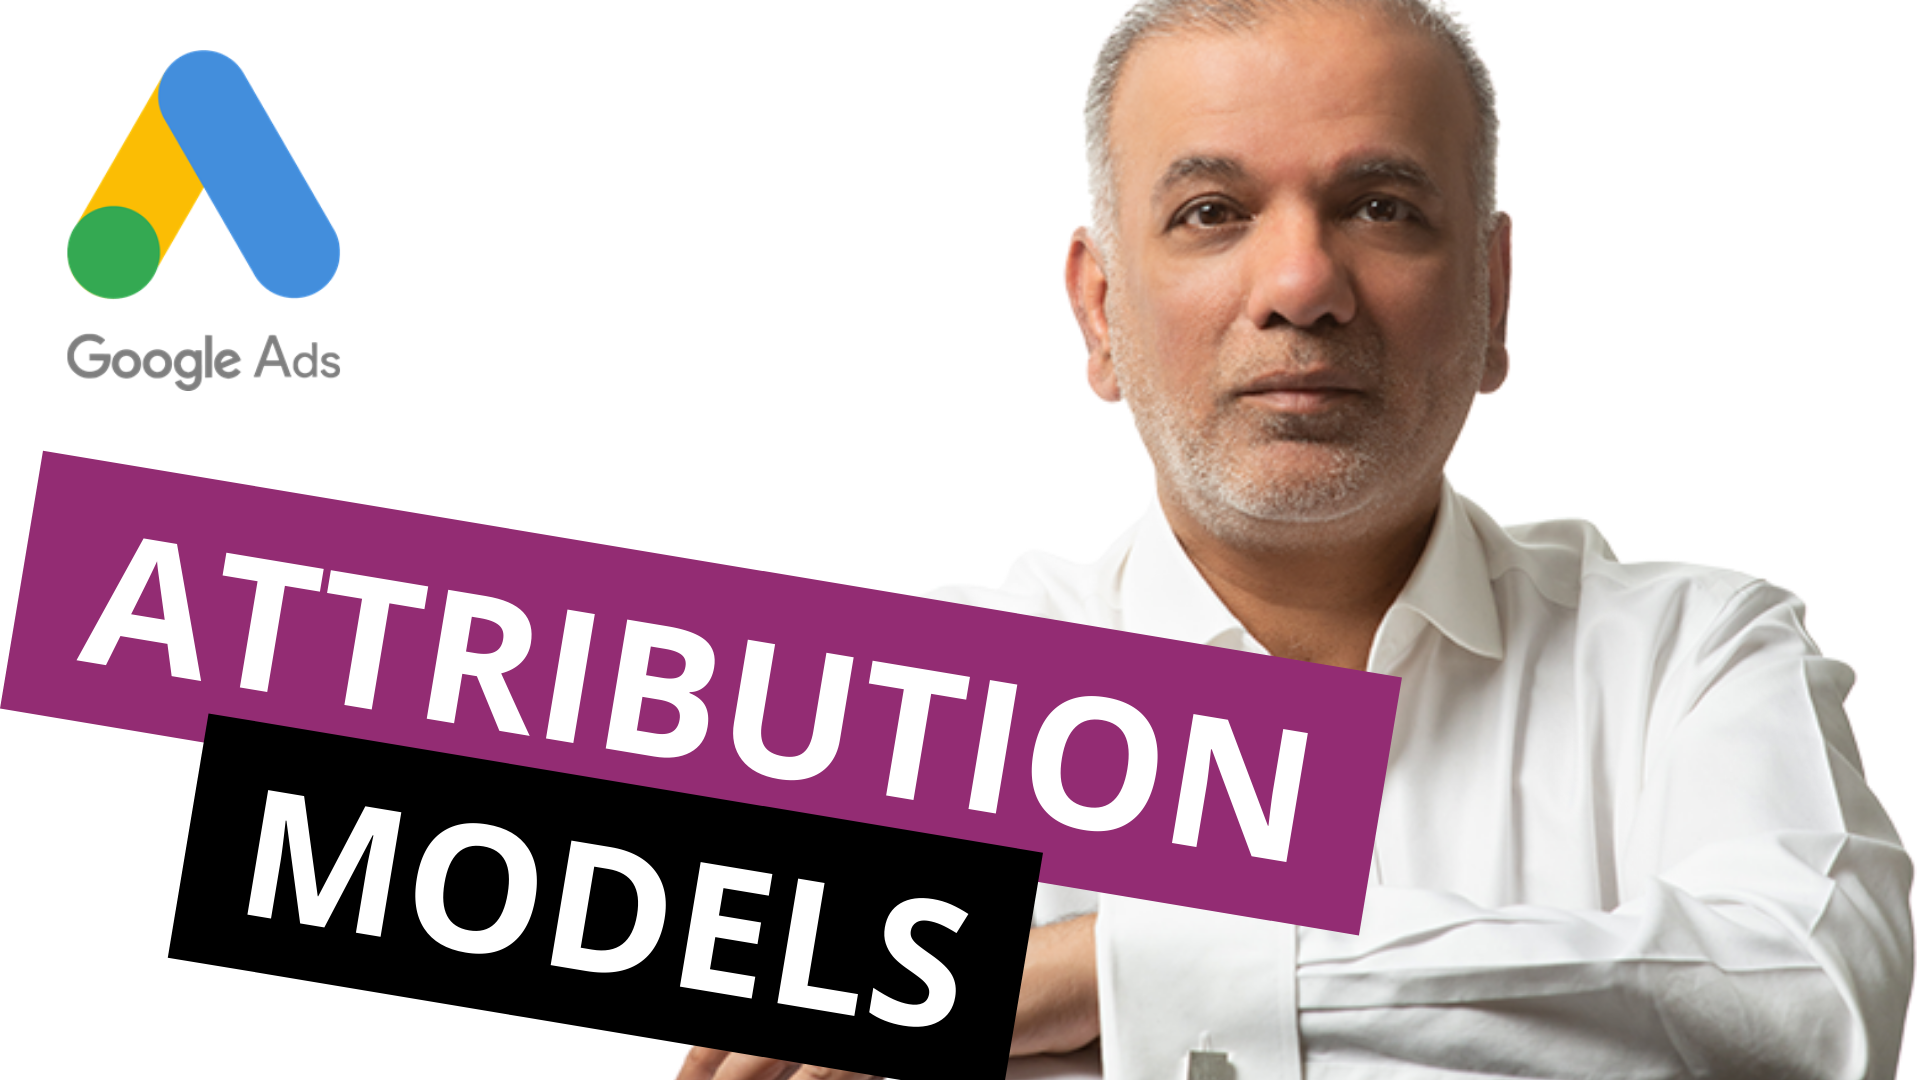 Google Ads Attribution Models Explained